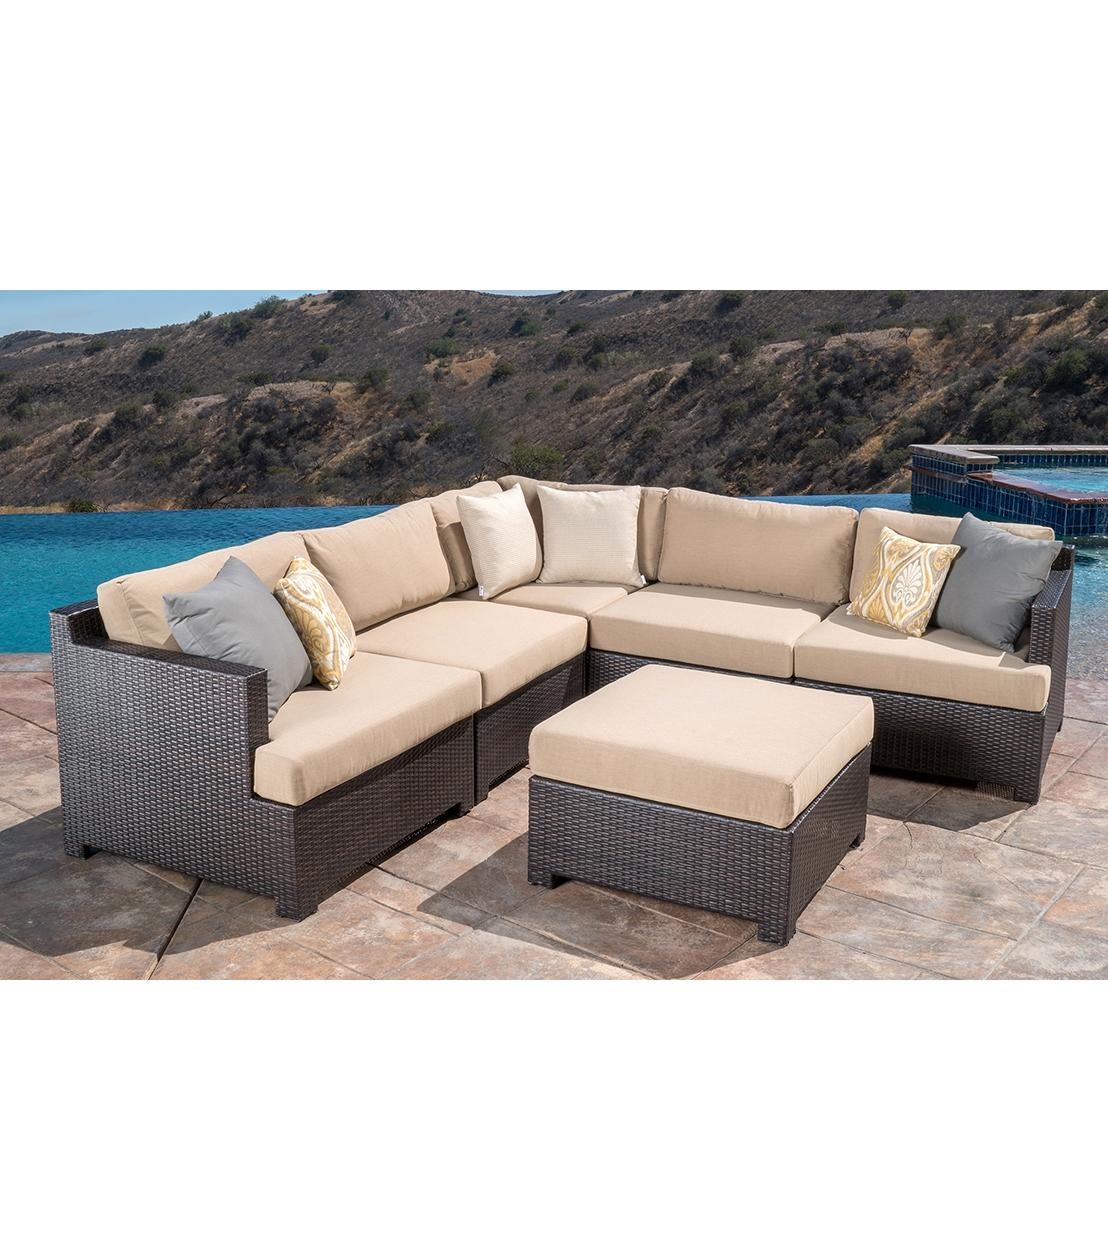 harper fabric 6 piece modular sectional sofa pierre paulin 12 ideas of